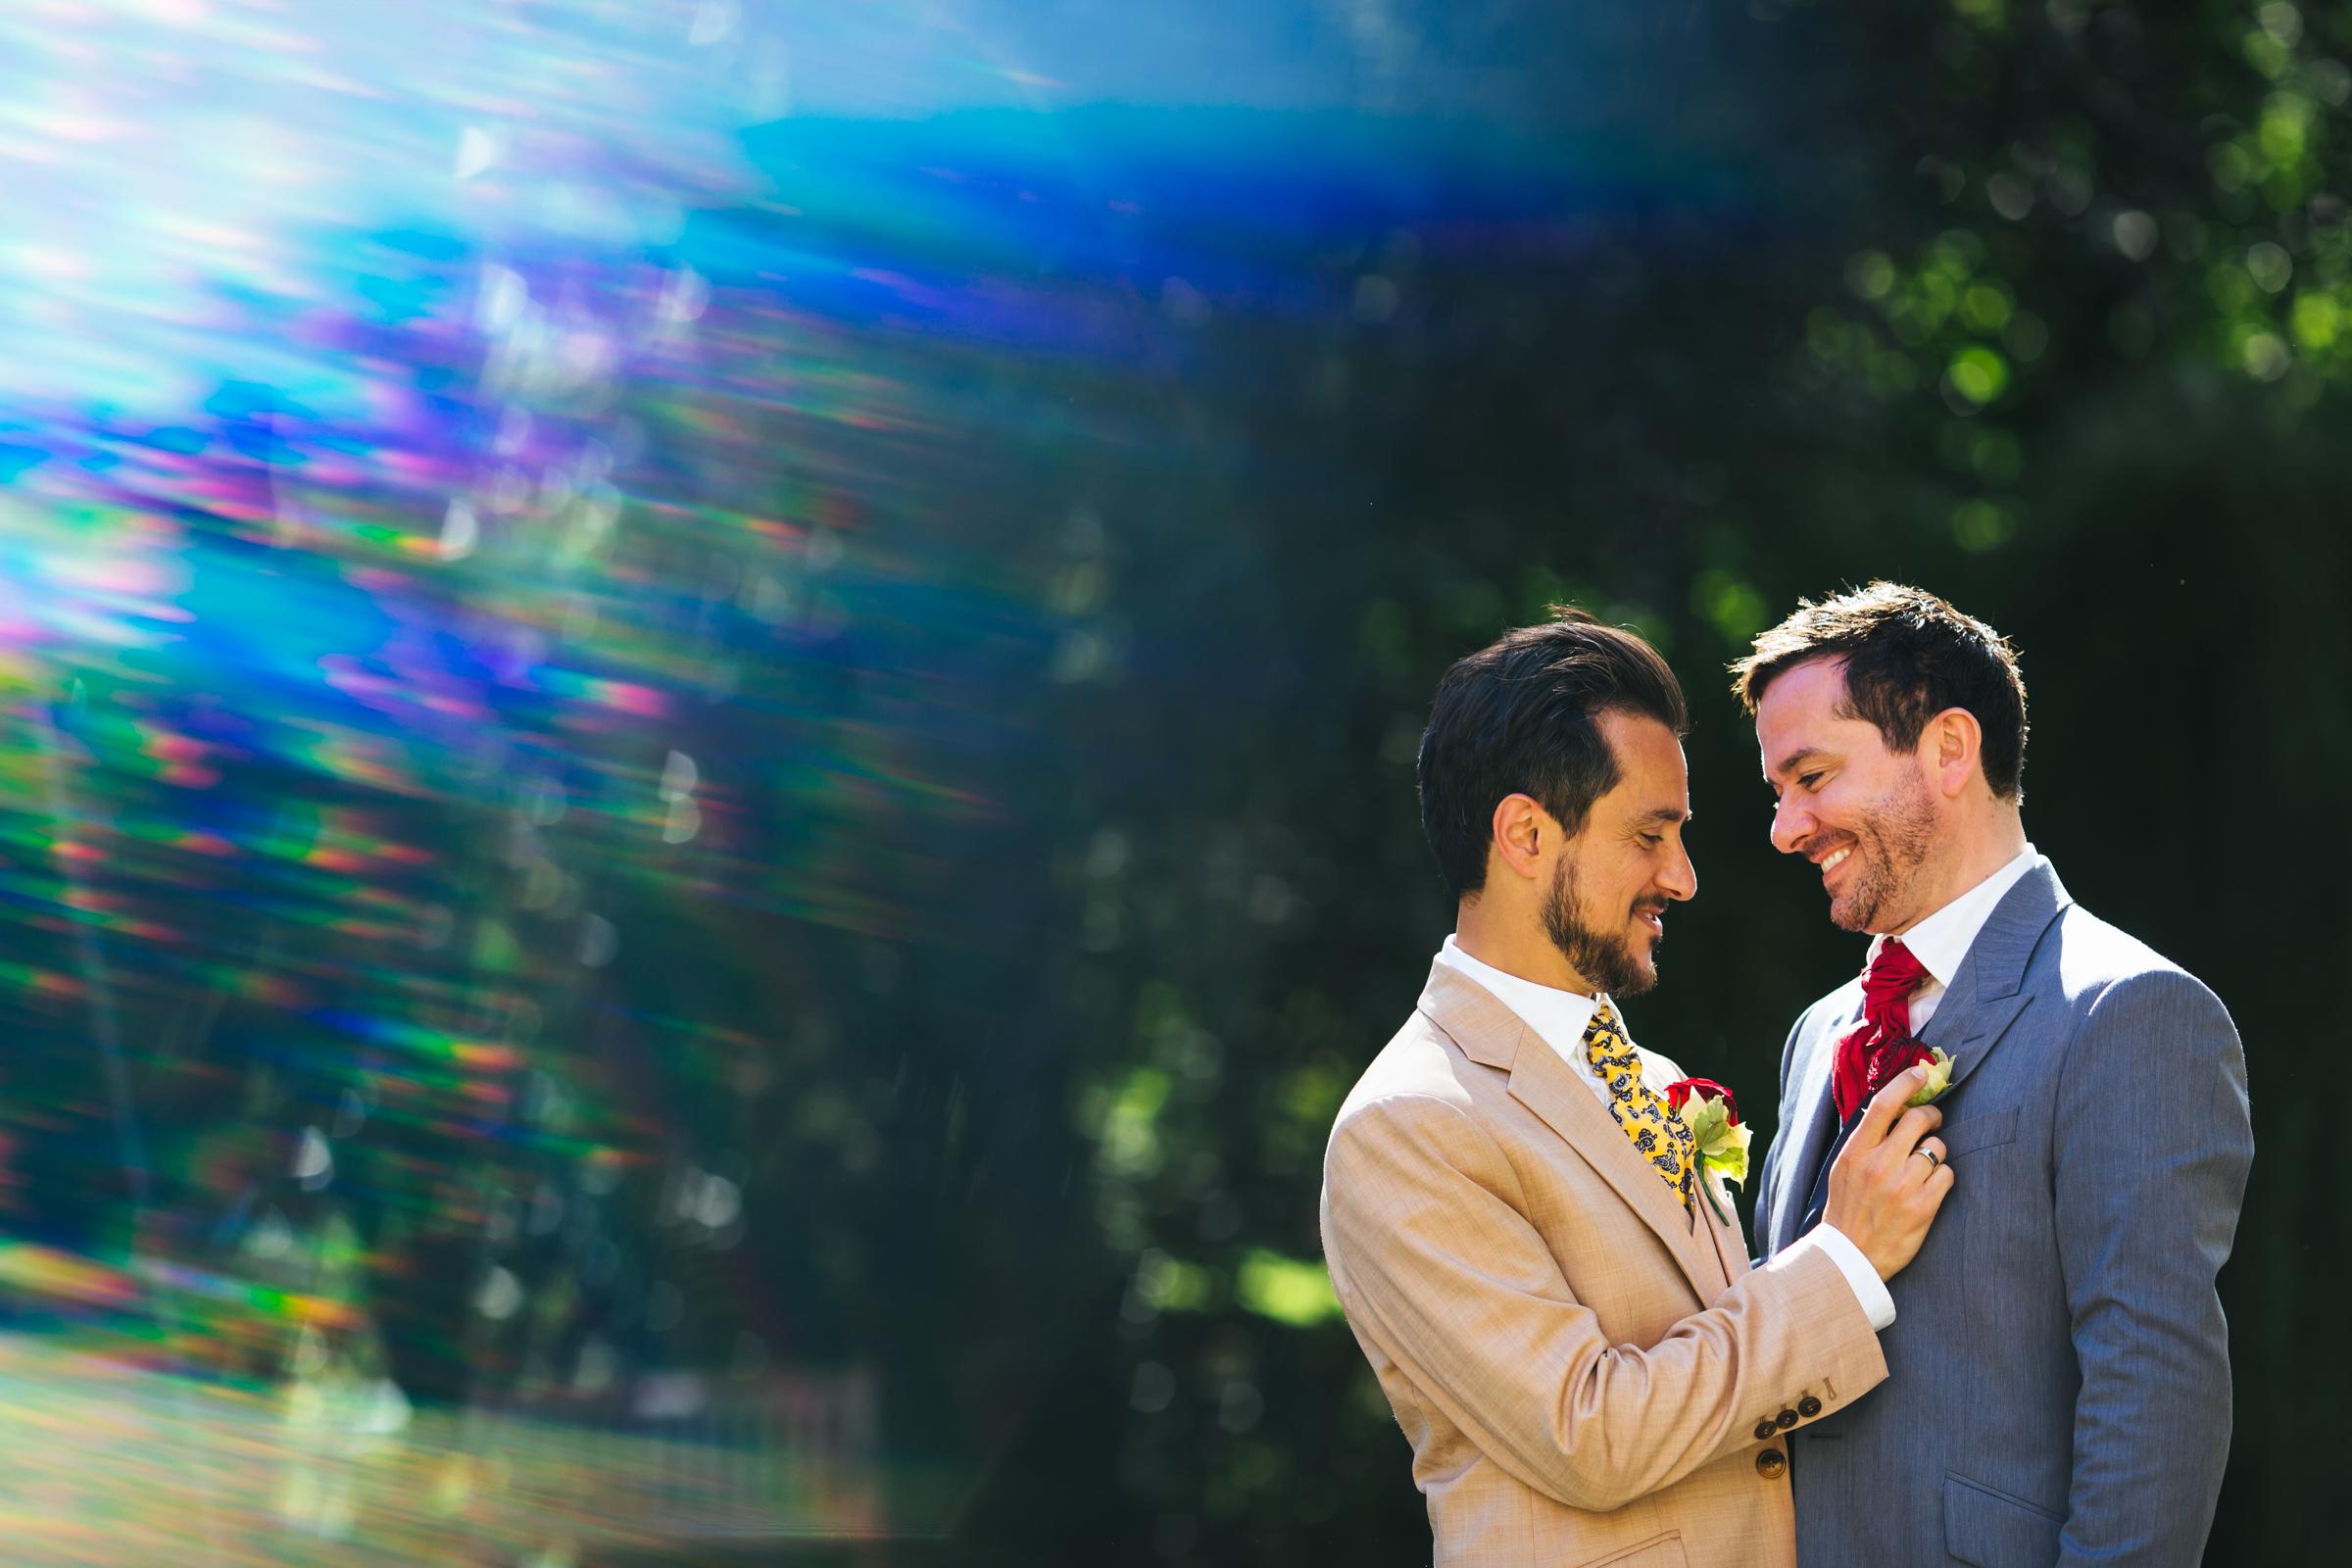 kings college cambridge university gay same sex wedding hertfordshire  wedding photographer rafe abrook photography-1113